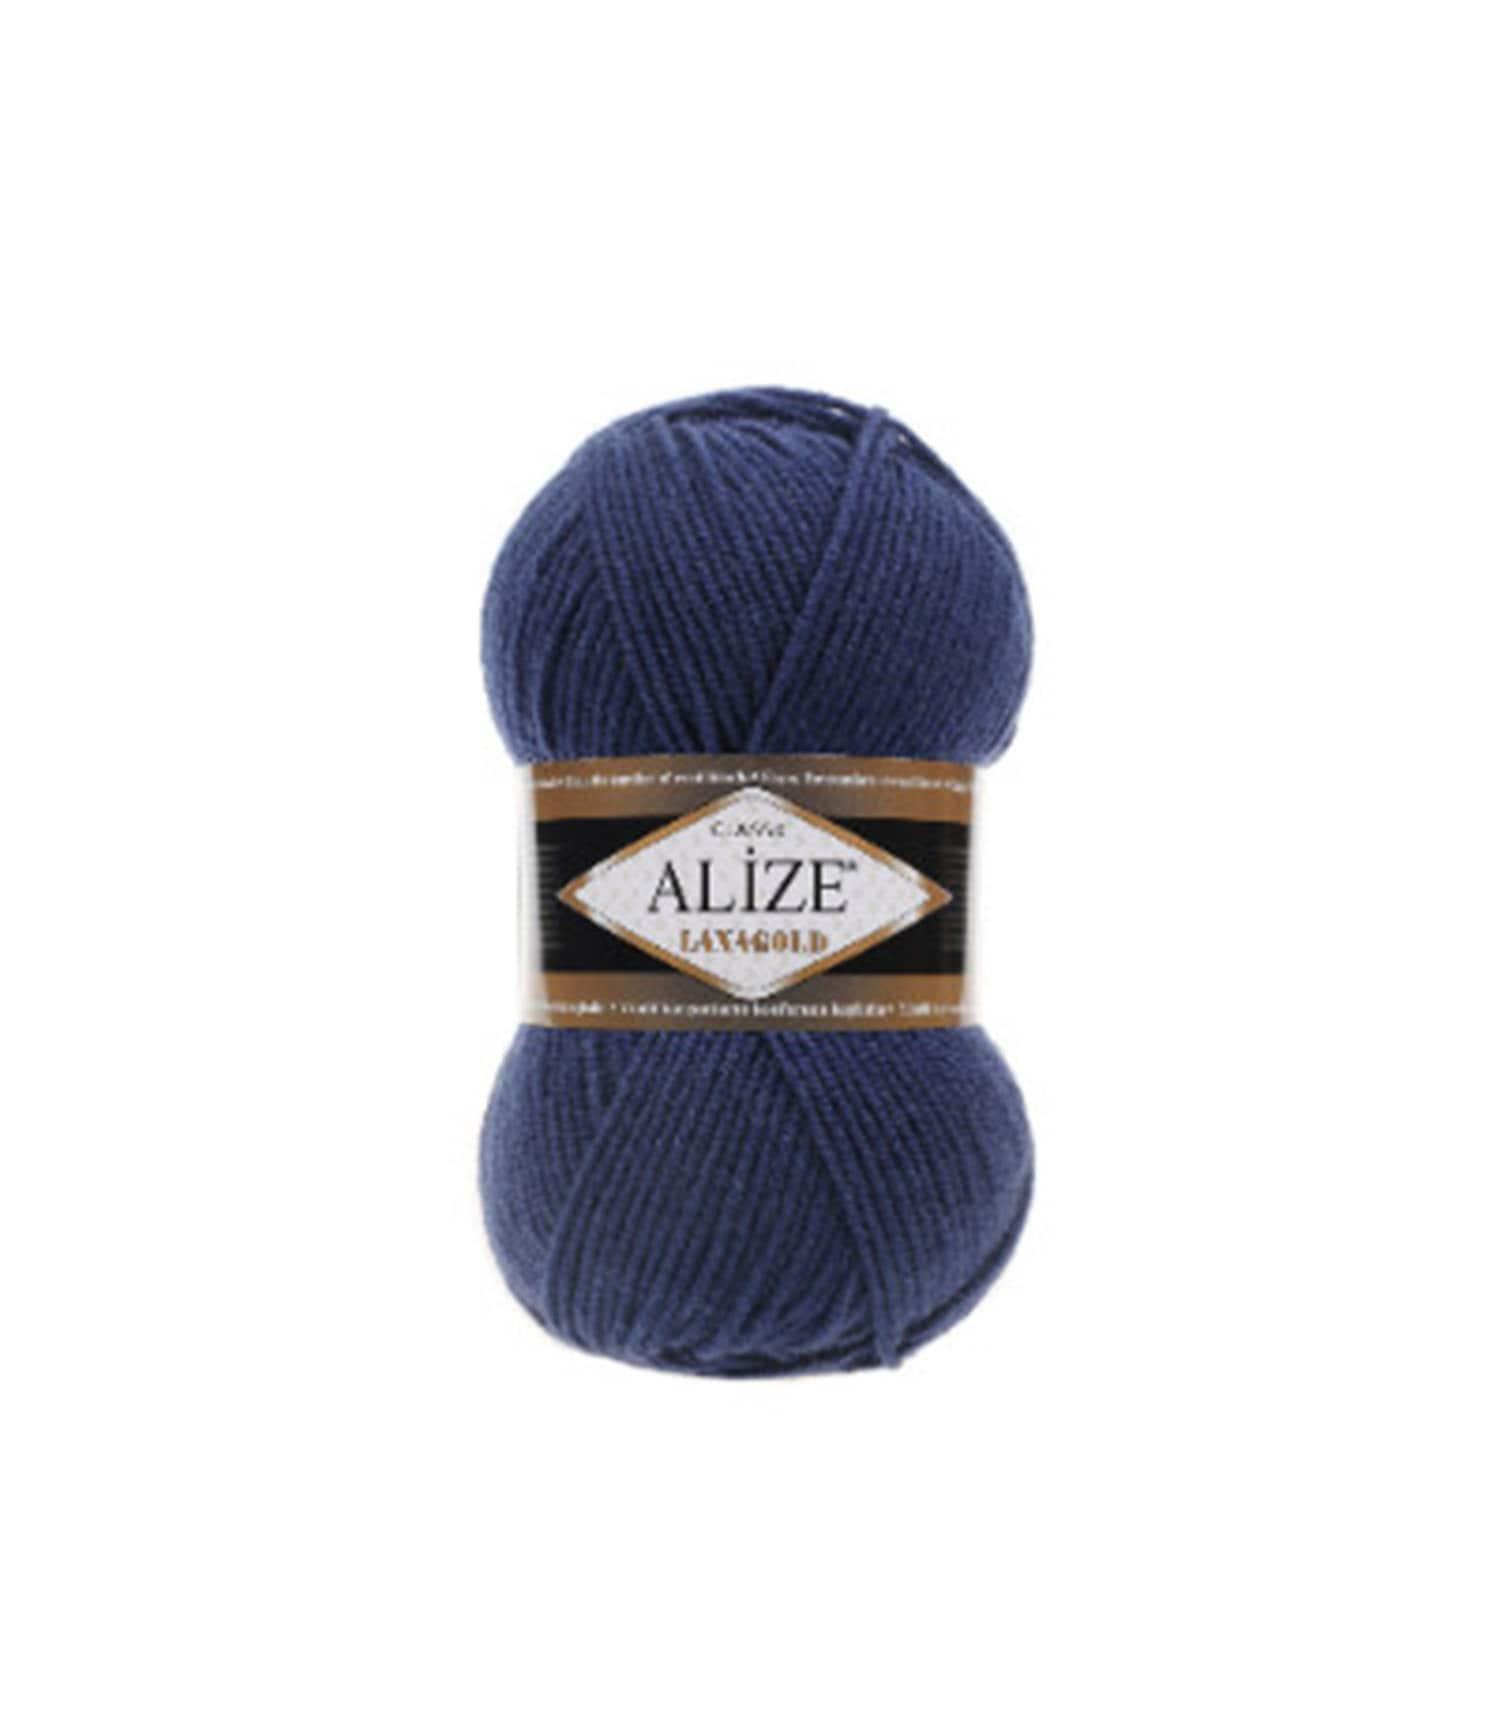 426 Petrol Handmade Alize 5 x 100 g Lanagold PREMIUM wool 49 percent wool and 51 percent acrylic